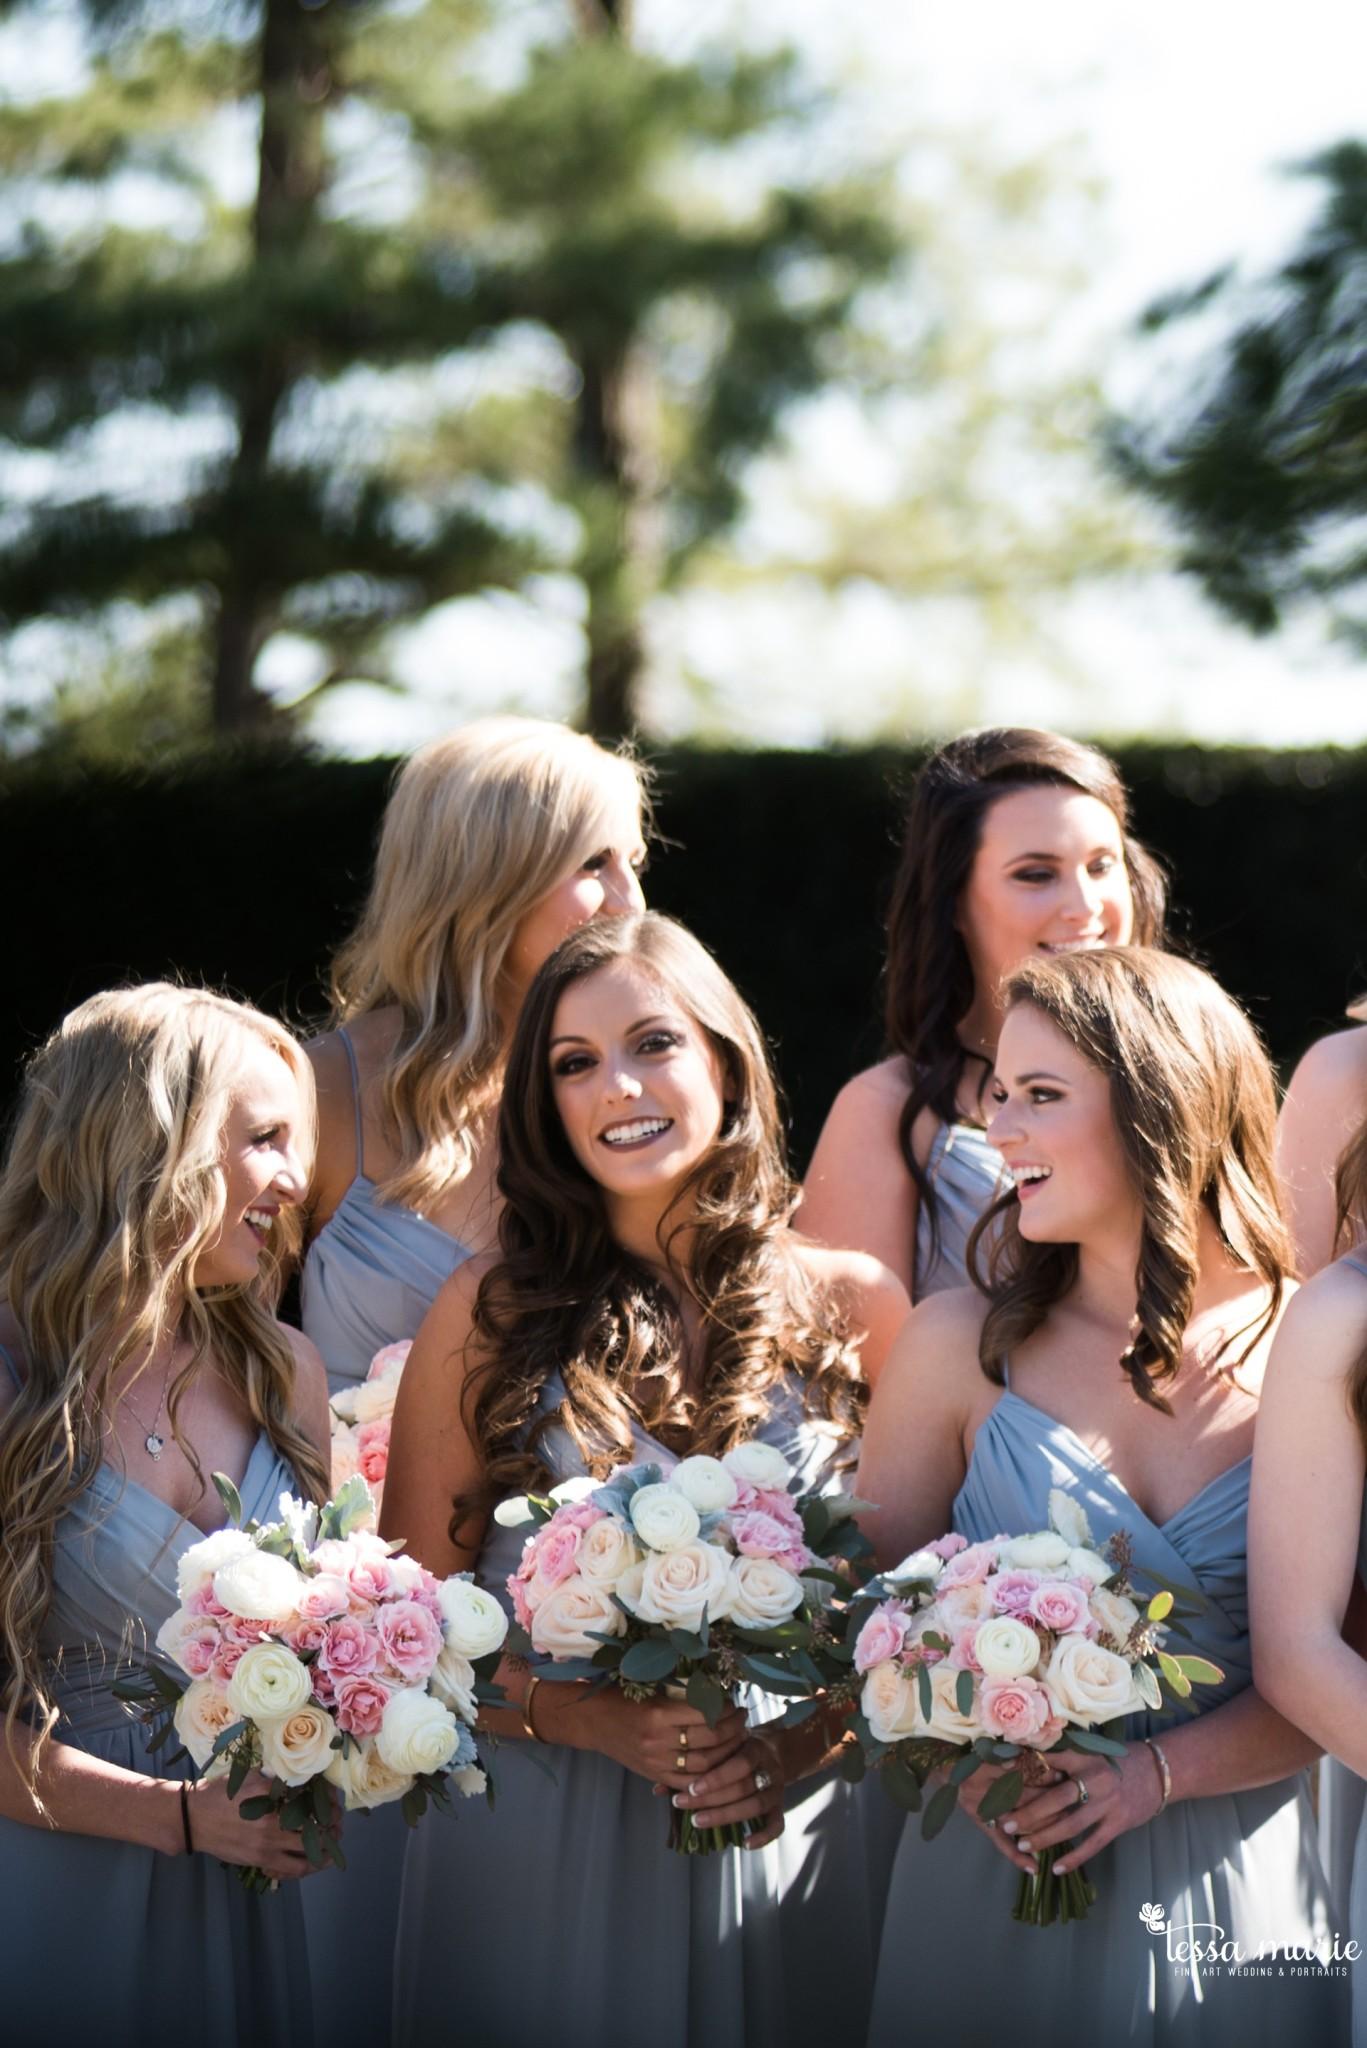 tessa_marie_legacy_moments_storytelling_candid_emotionally_driven_wedding_photographer_atlanta_wedding_photography_st_ives_country_club_wedding_boukates_bridals_by_lori_0019